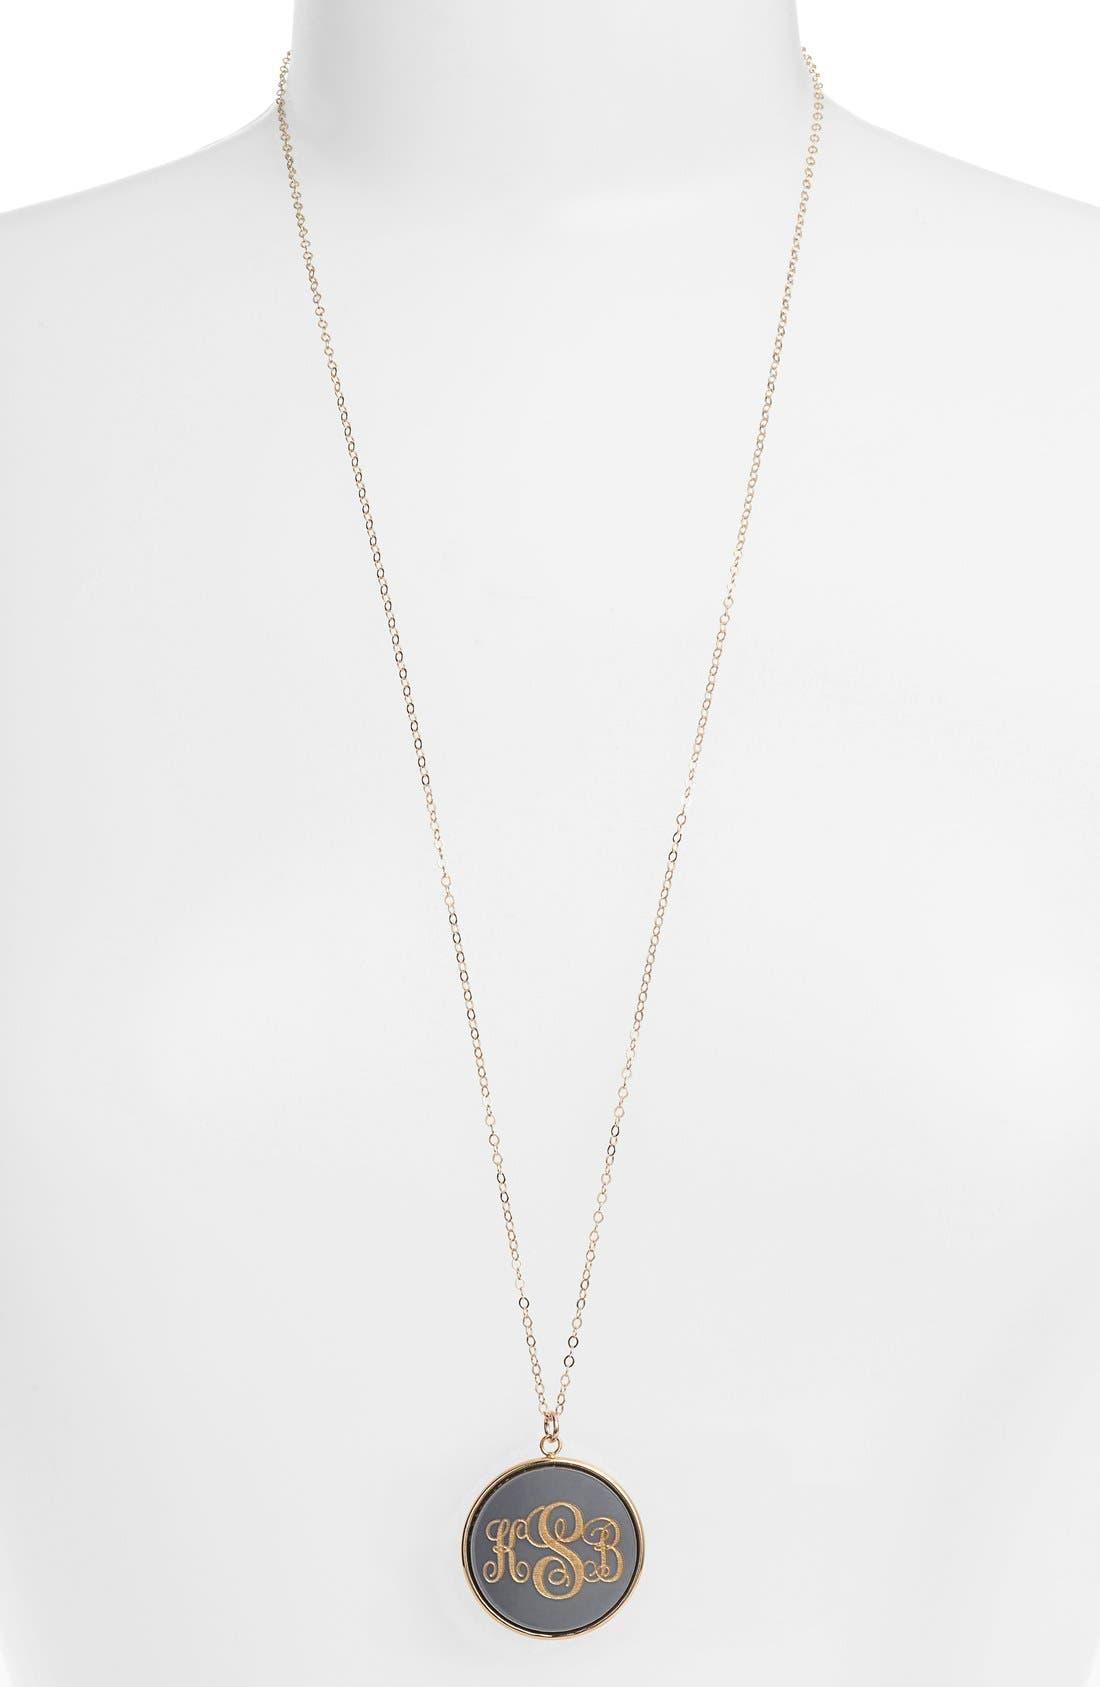 MOON AND LOLA 'Vineyard' Personalized Monogram Pendant Necklace, Main, color, GUNMETAL